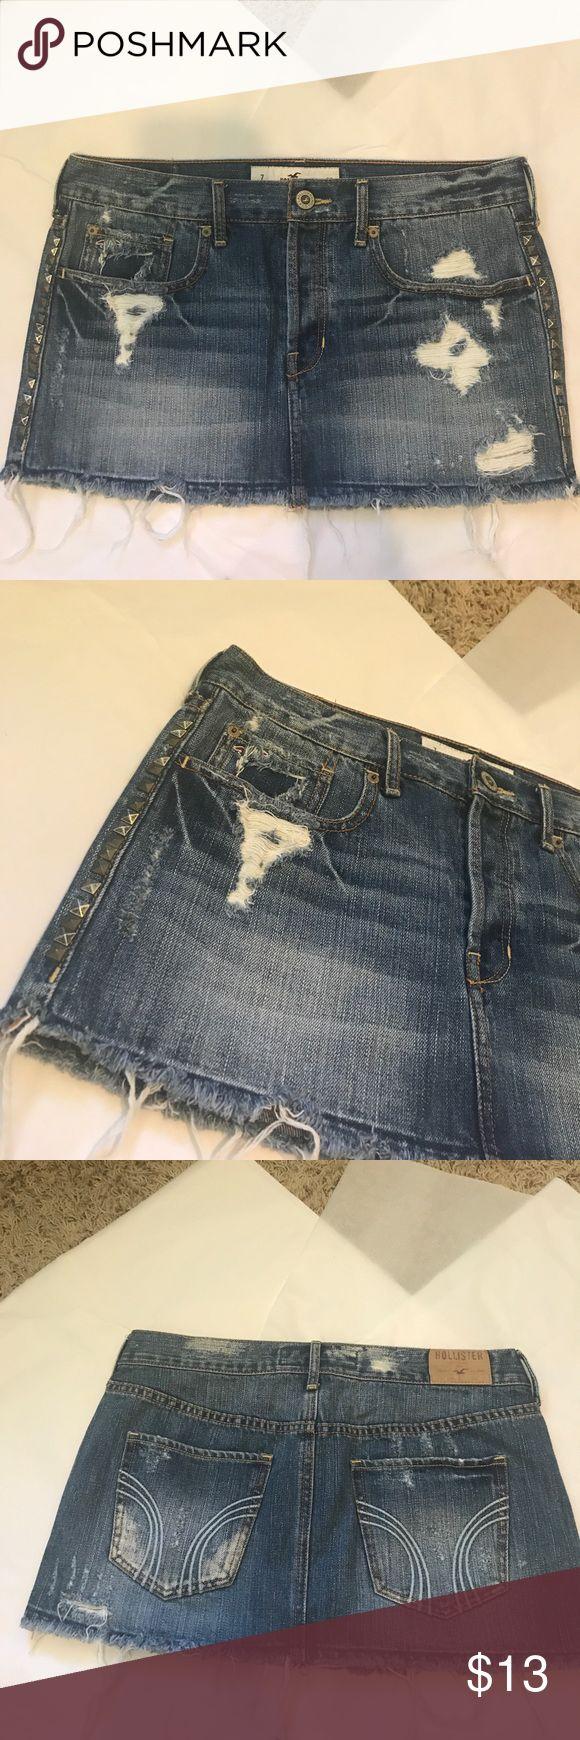 ⚡️ SALE ⚡️Hollister Distressed Jean Mini Skirt Hollister Distressed Jean Mini Skirt in excellent condition! Hollister Skirts Mini